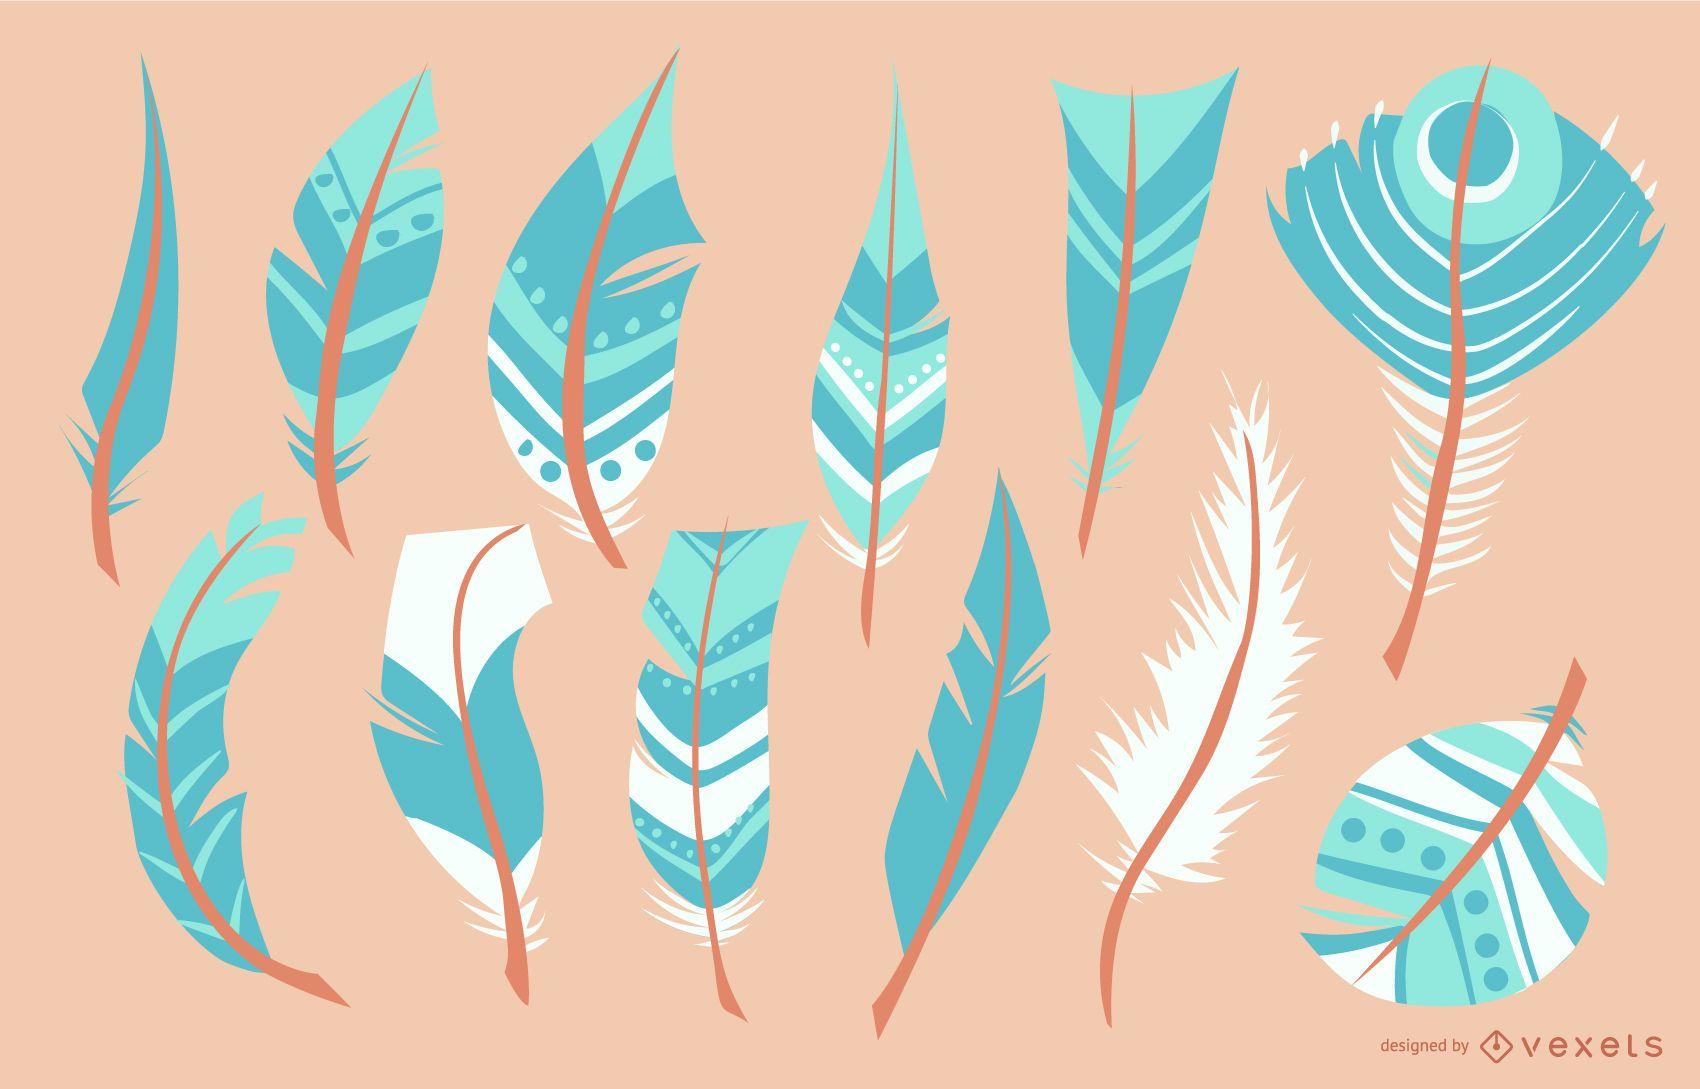 Turquoise Feather Illustration Set